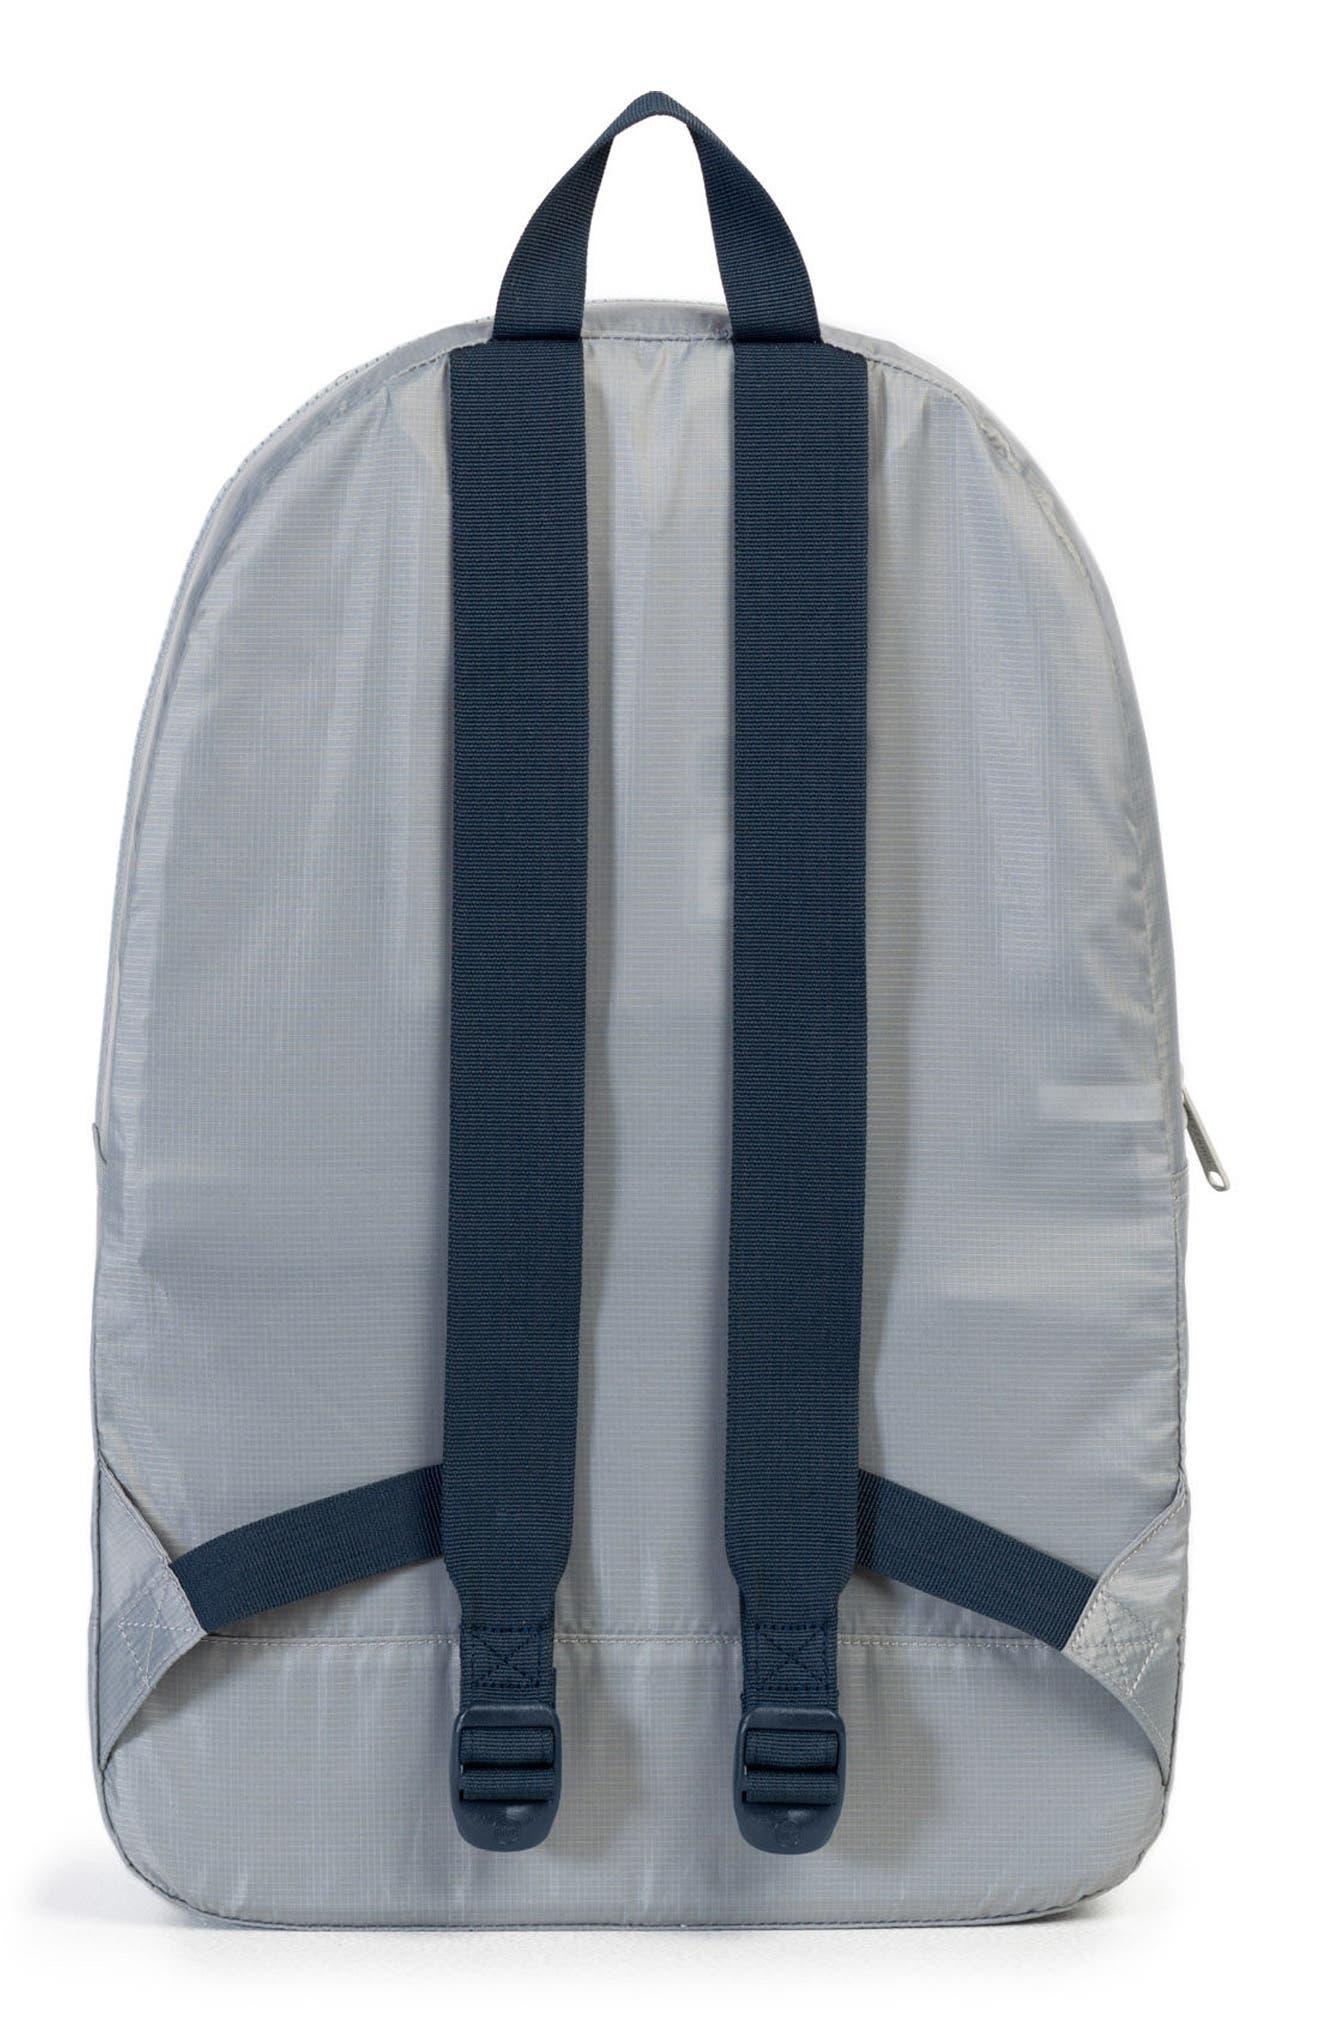 Packable - MLB American League Backpack,                             Alternate thumbnail 2, color,                             New York Yankees